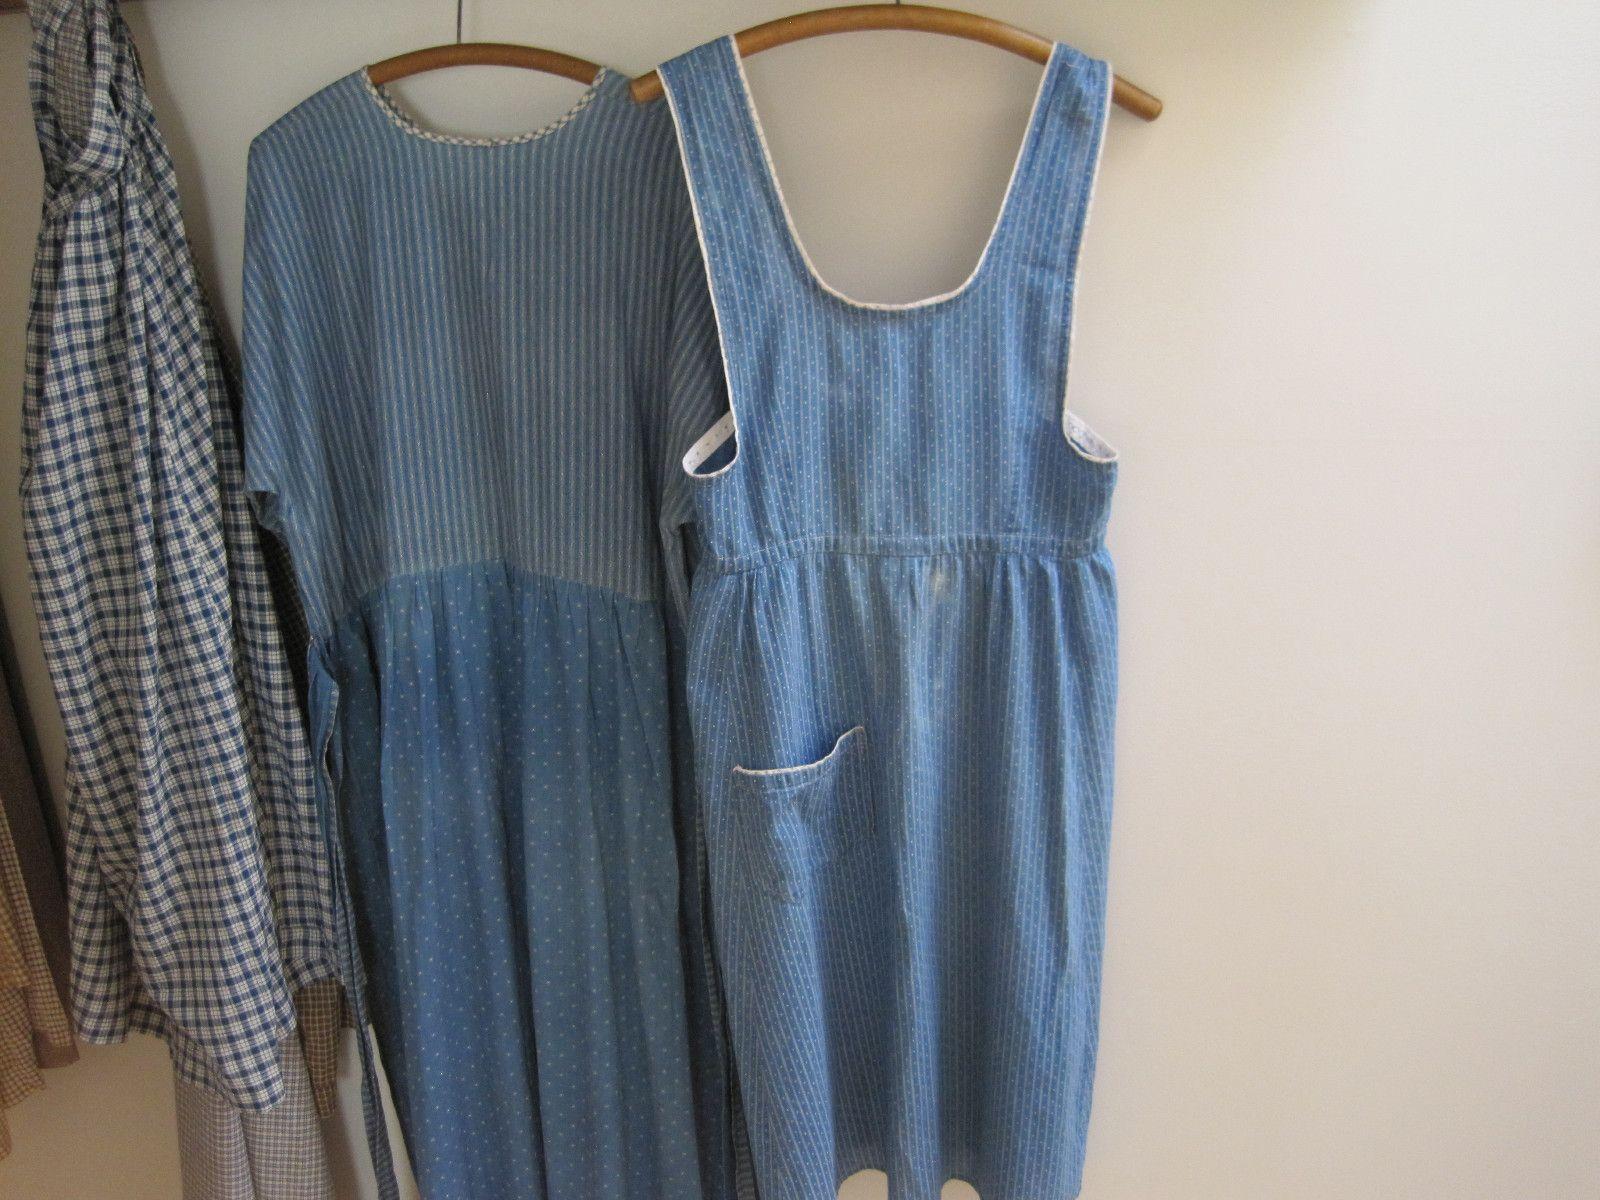 White pinafore apron ebay - Old Blue And White Calico Fabric Ladies Pinafore Apron Single Pocket Primitive Ebay